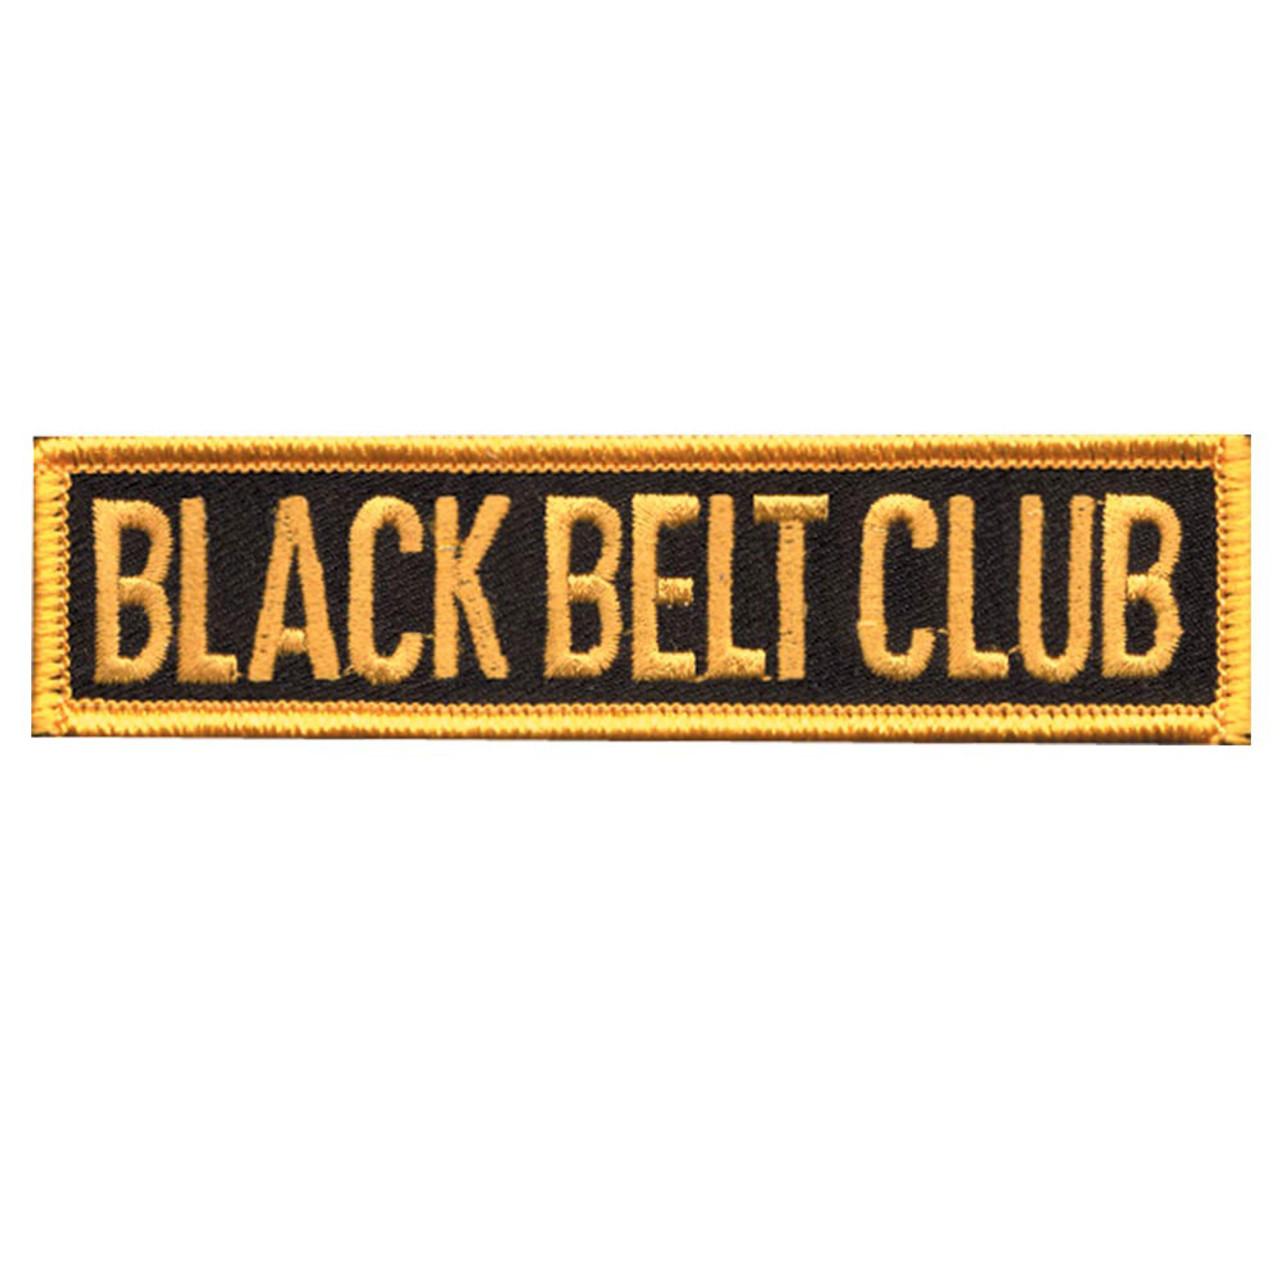 Black Belt Club - Belt Patch